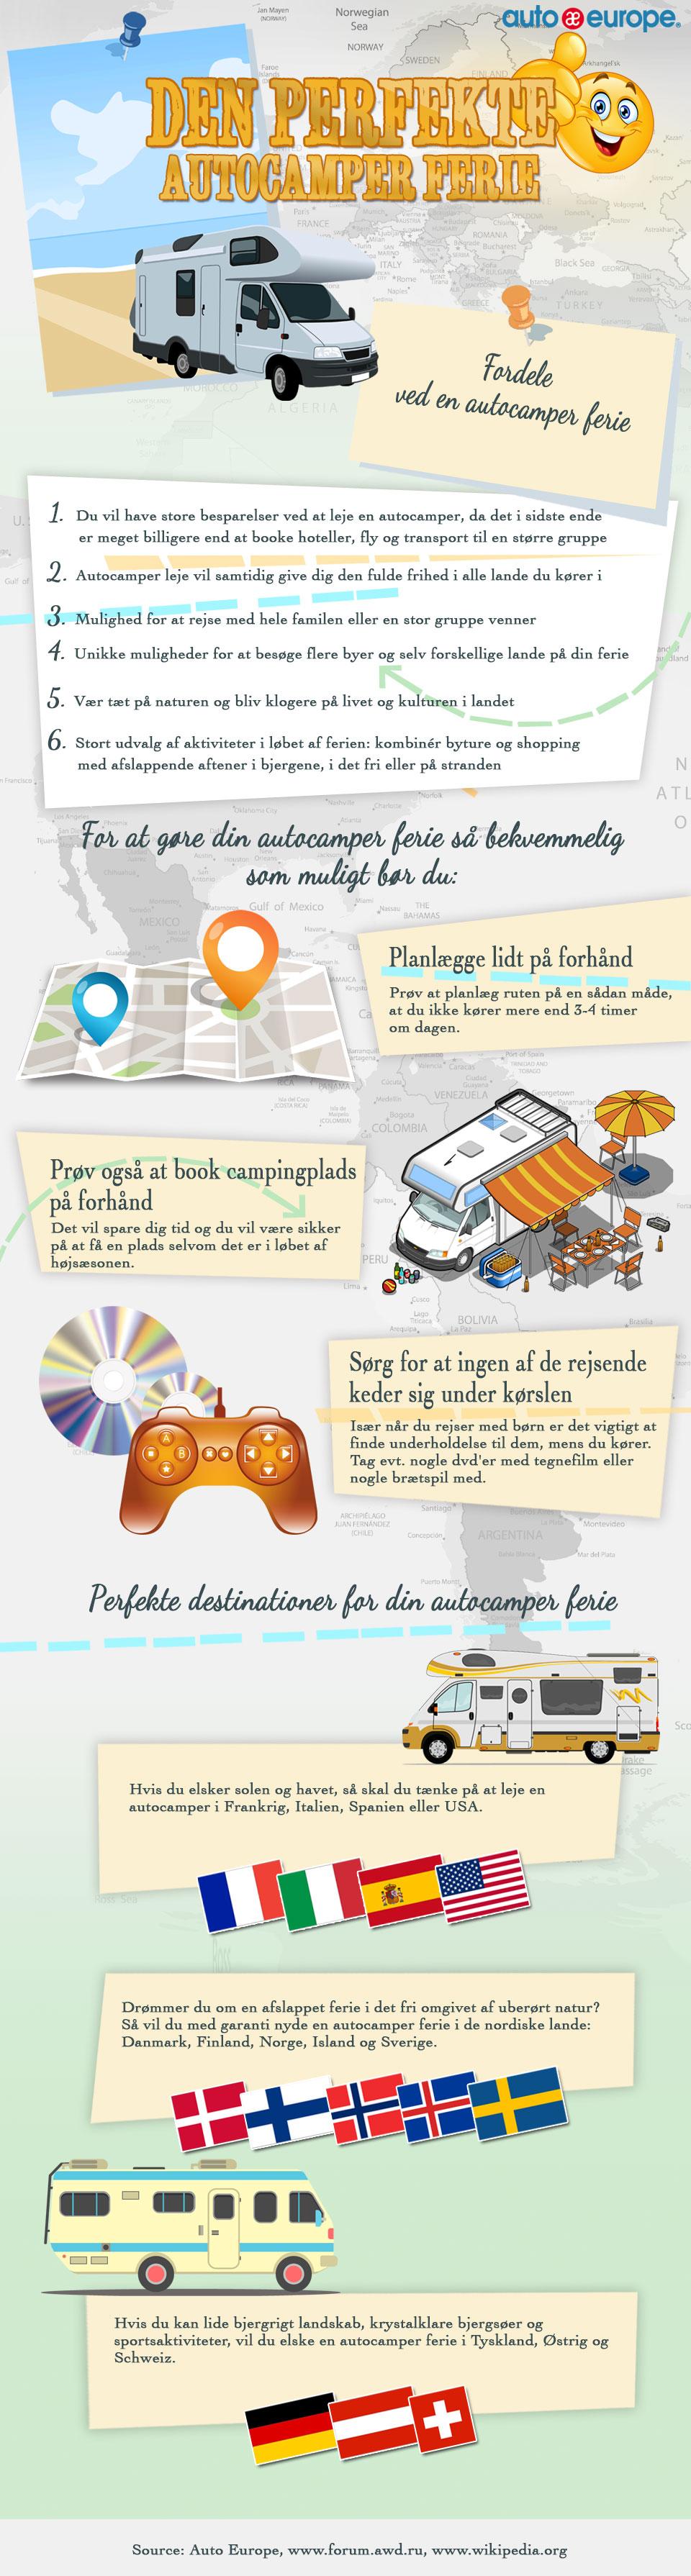 Infografik: Den perfekte autocamper